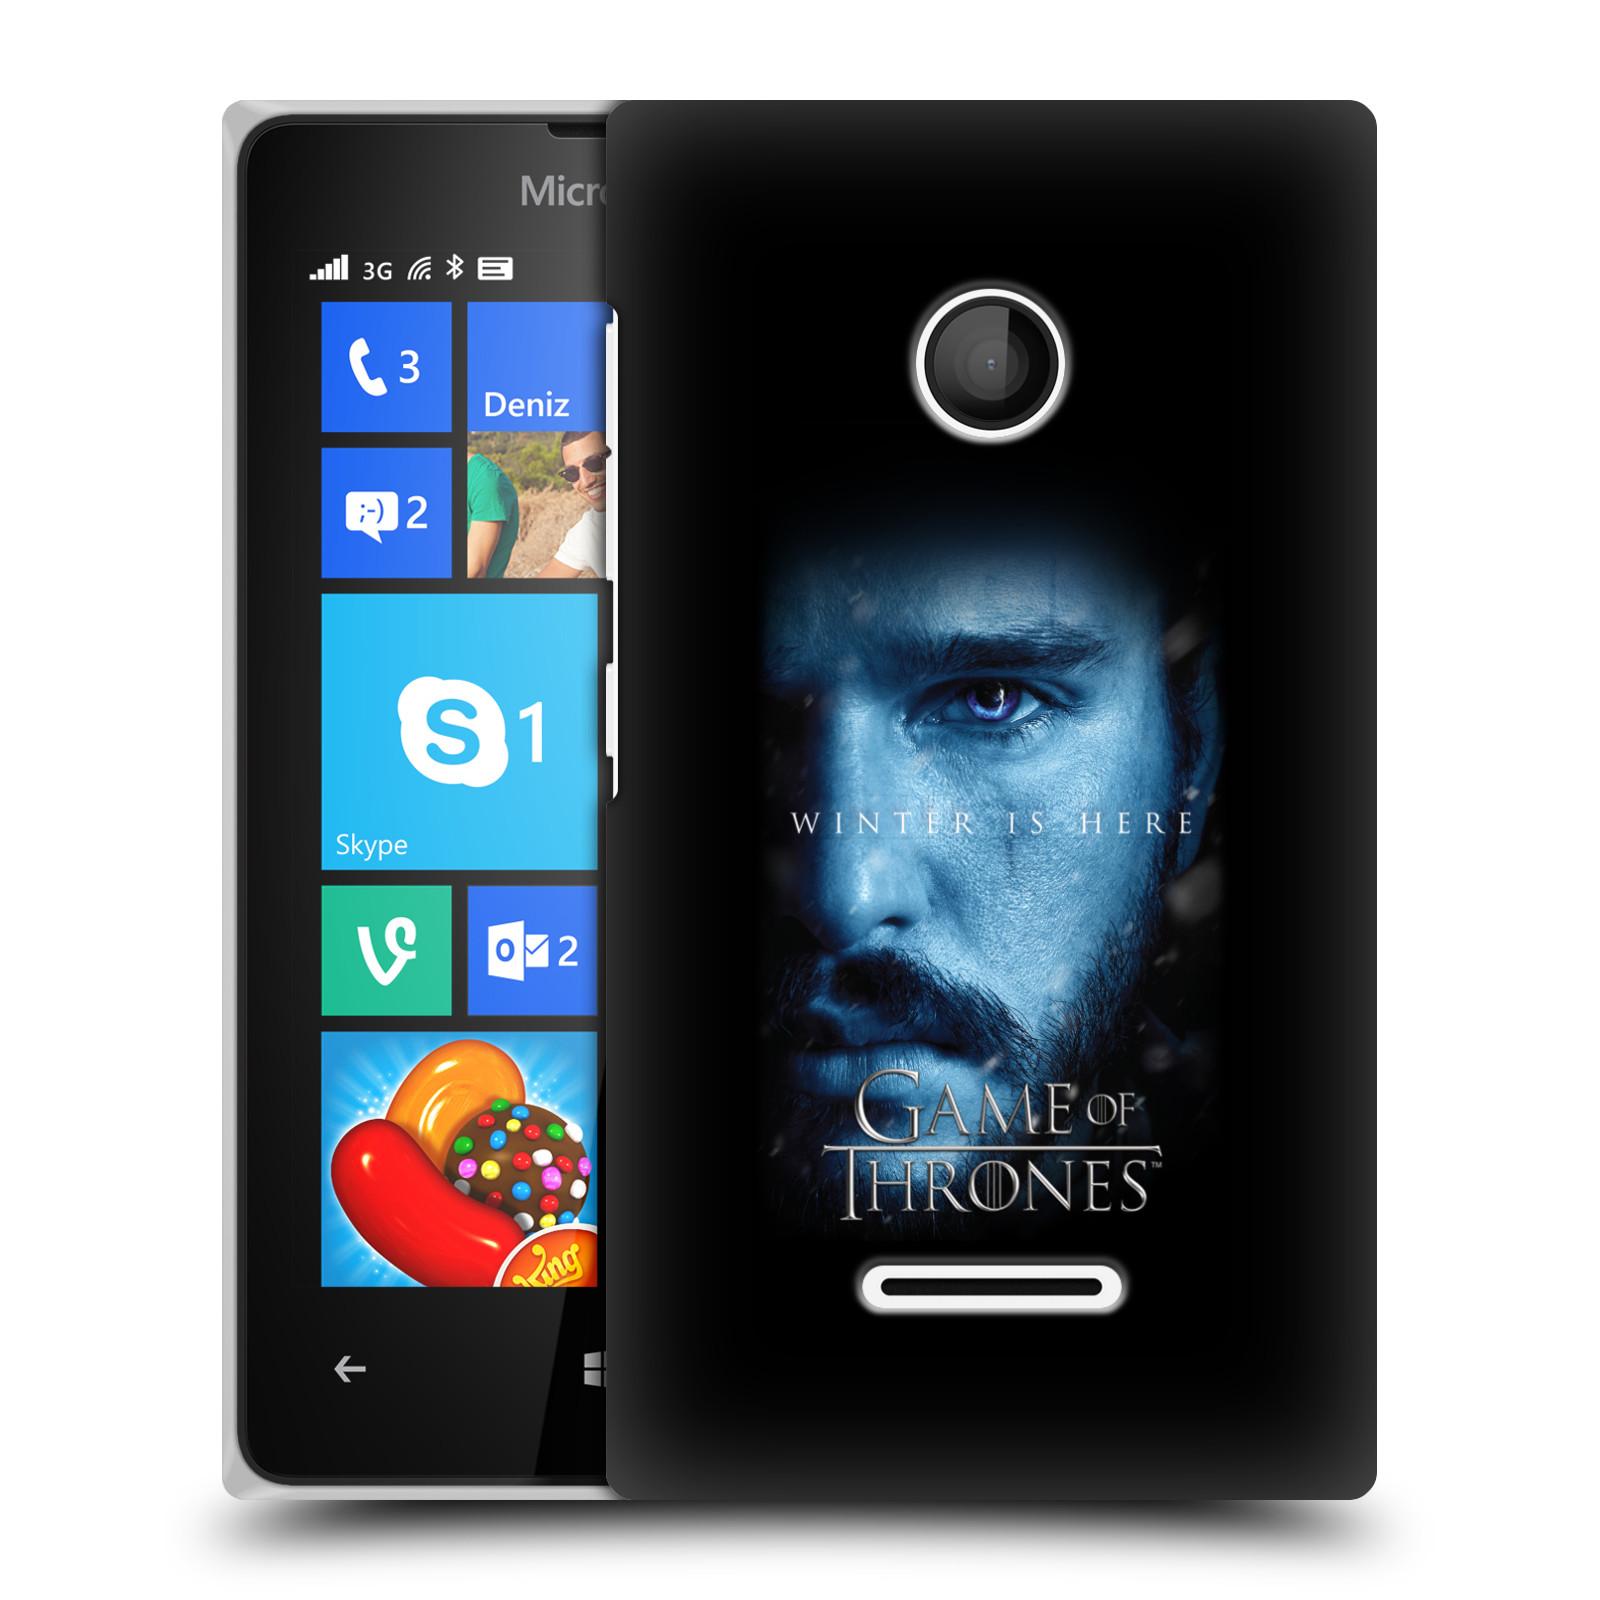 Plastové pouzdro na mobil Microsoft Lumia 435 - Head Case - Hra o trůny - Jon Snow - Winter is here (Plastový kryt či obal na mobilní telefon s motivem Game of Thrones - Jon Snow - Winter is here - Season 7 pro Microsoft Lumia 435)